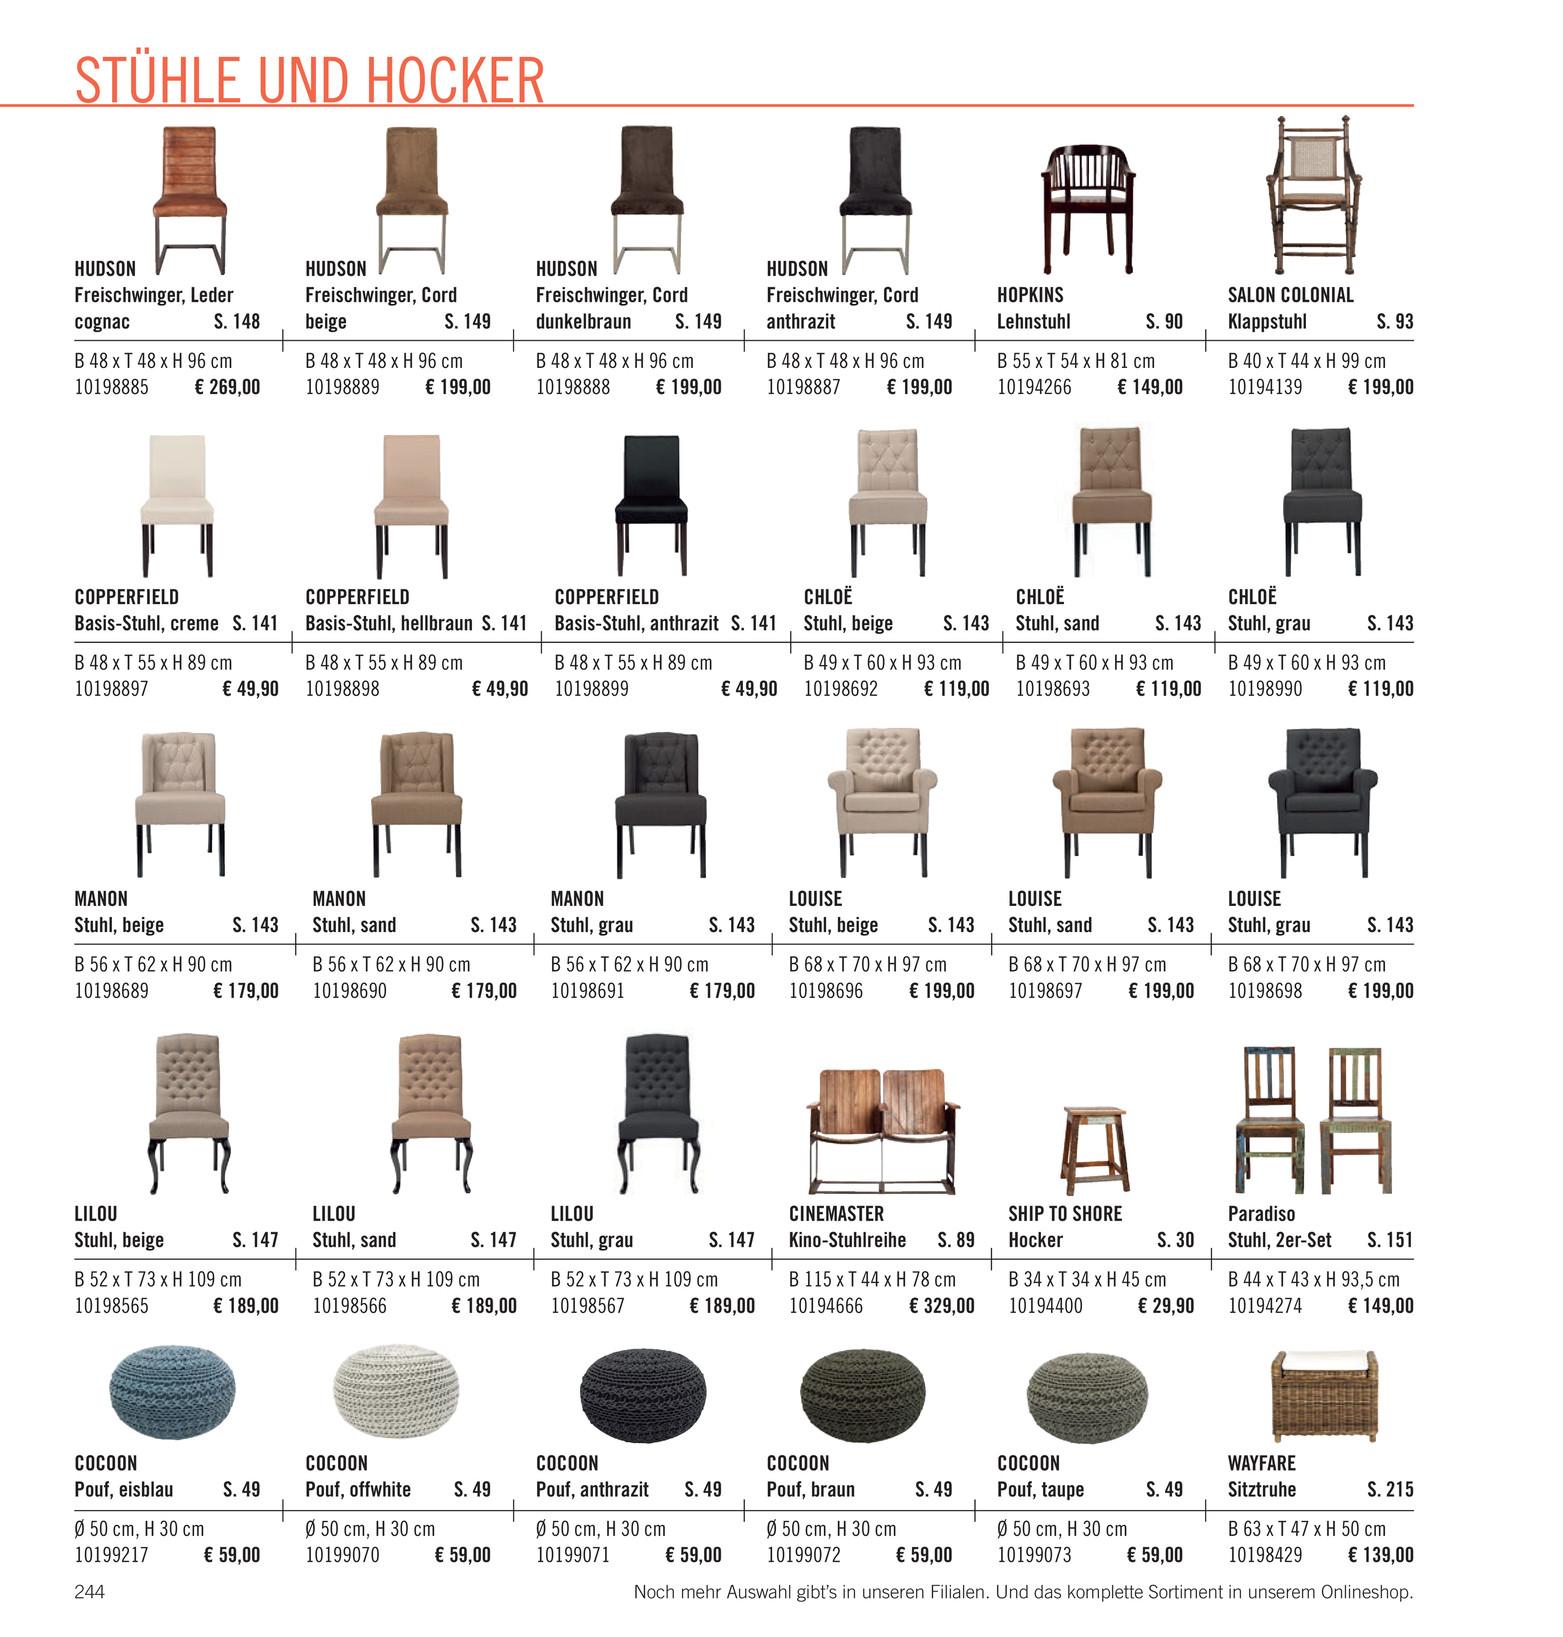 Butlers Katalog De Wohnst Cke Katalog 2014 Seite 244 245